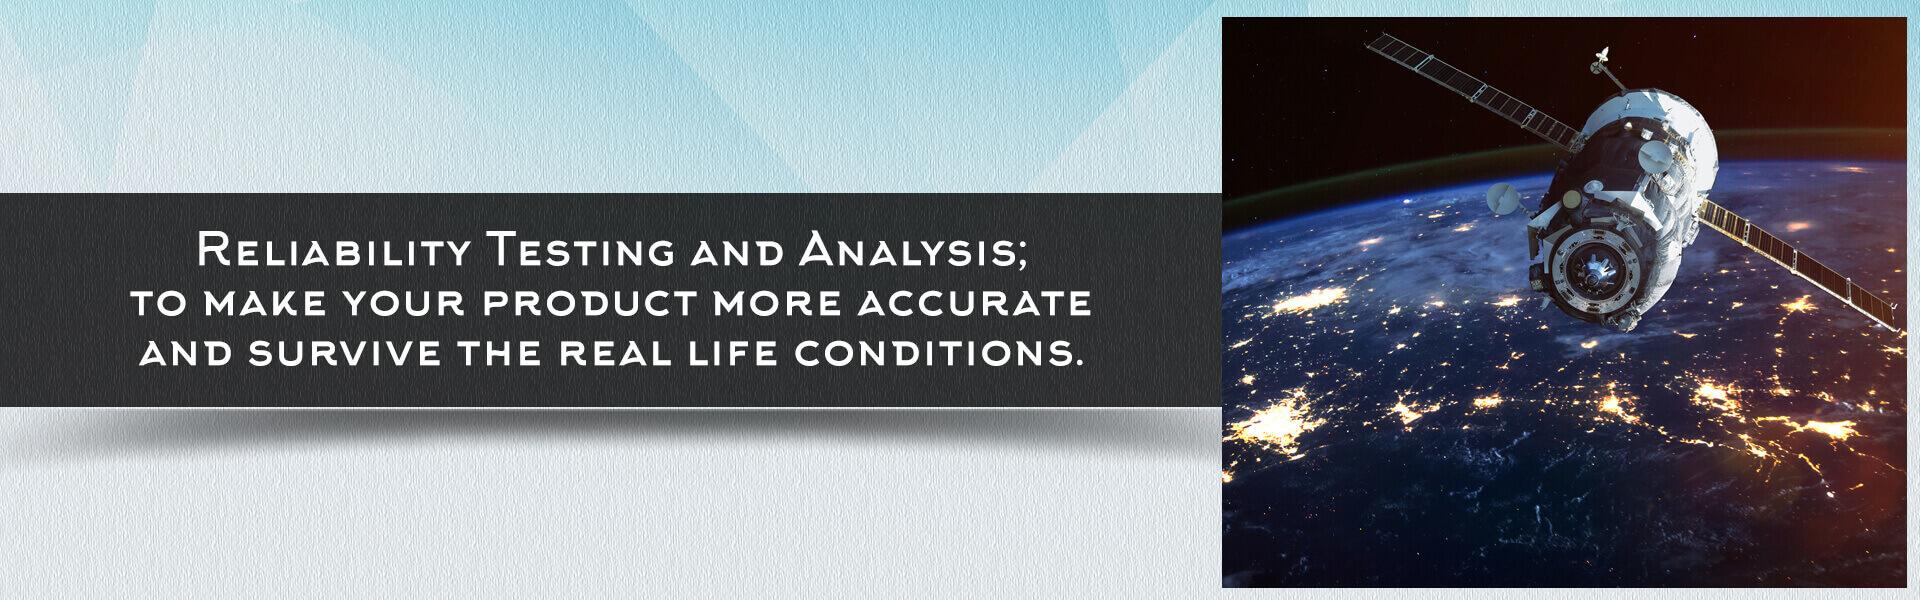 Envitest Laboratories - Reliability Testing & Analysis